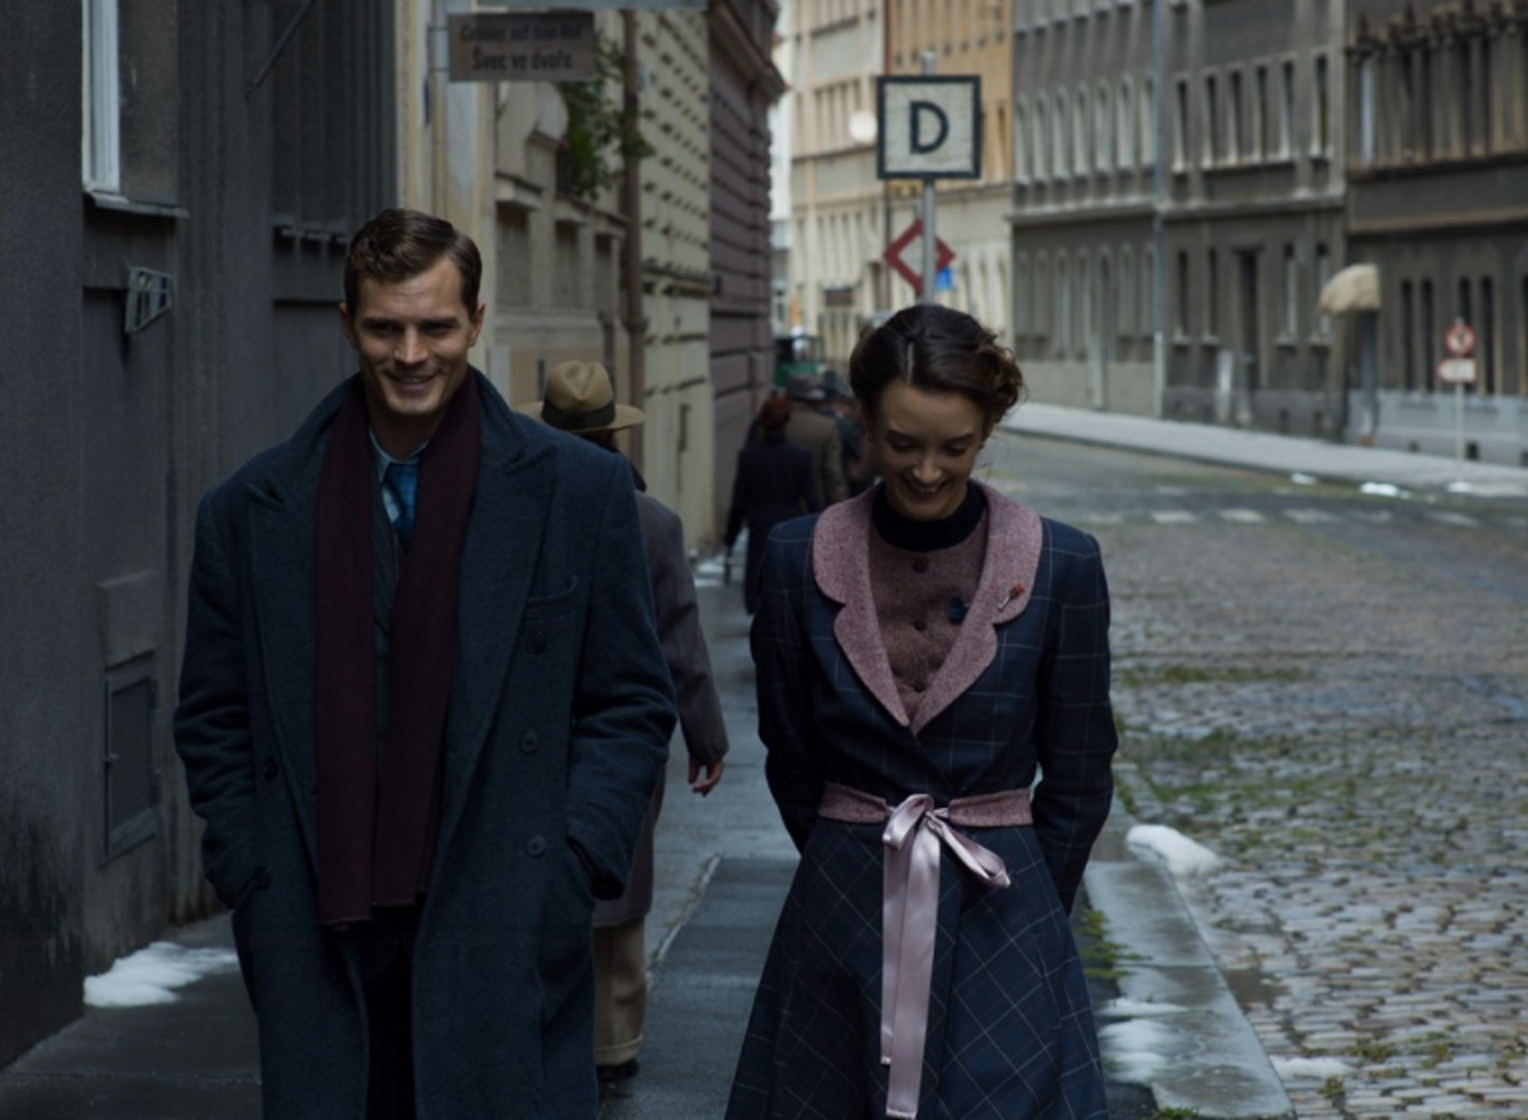 Jamie Dornan and Charlotte Le Bon in 'Anthropoid'.